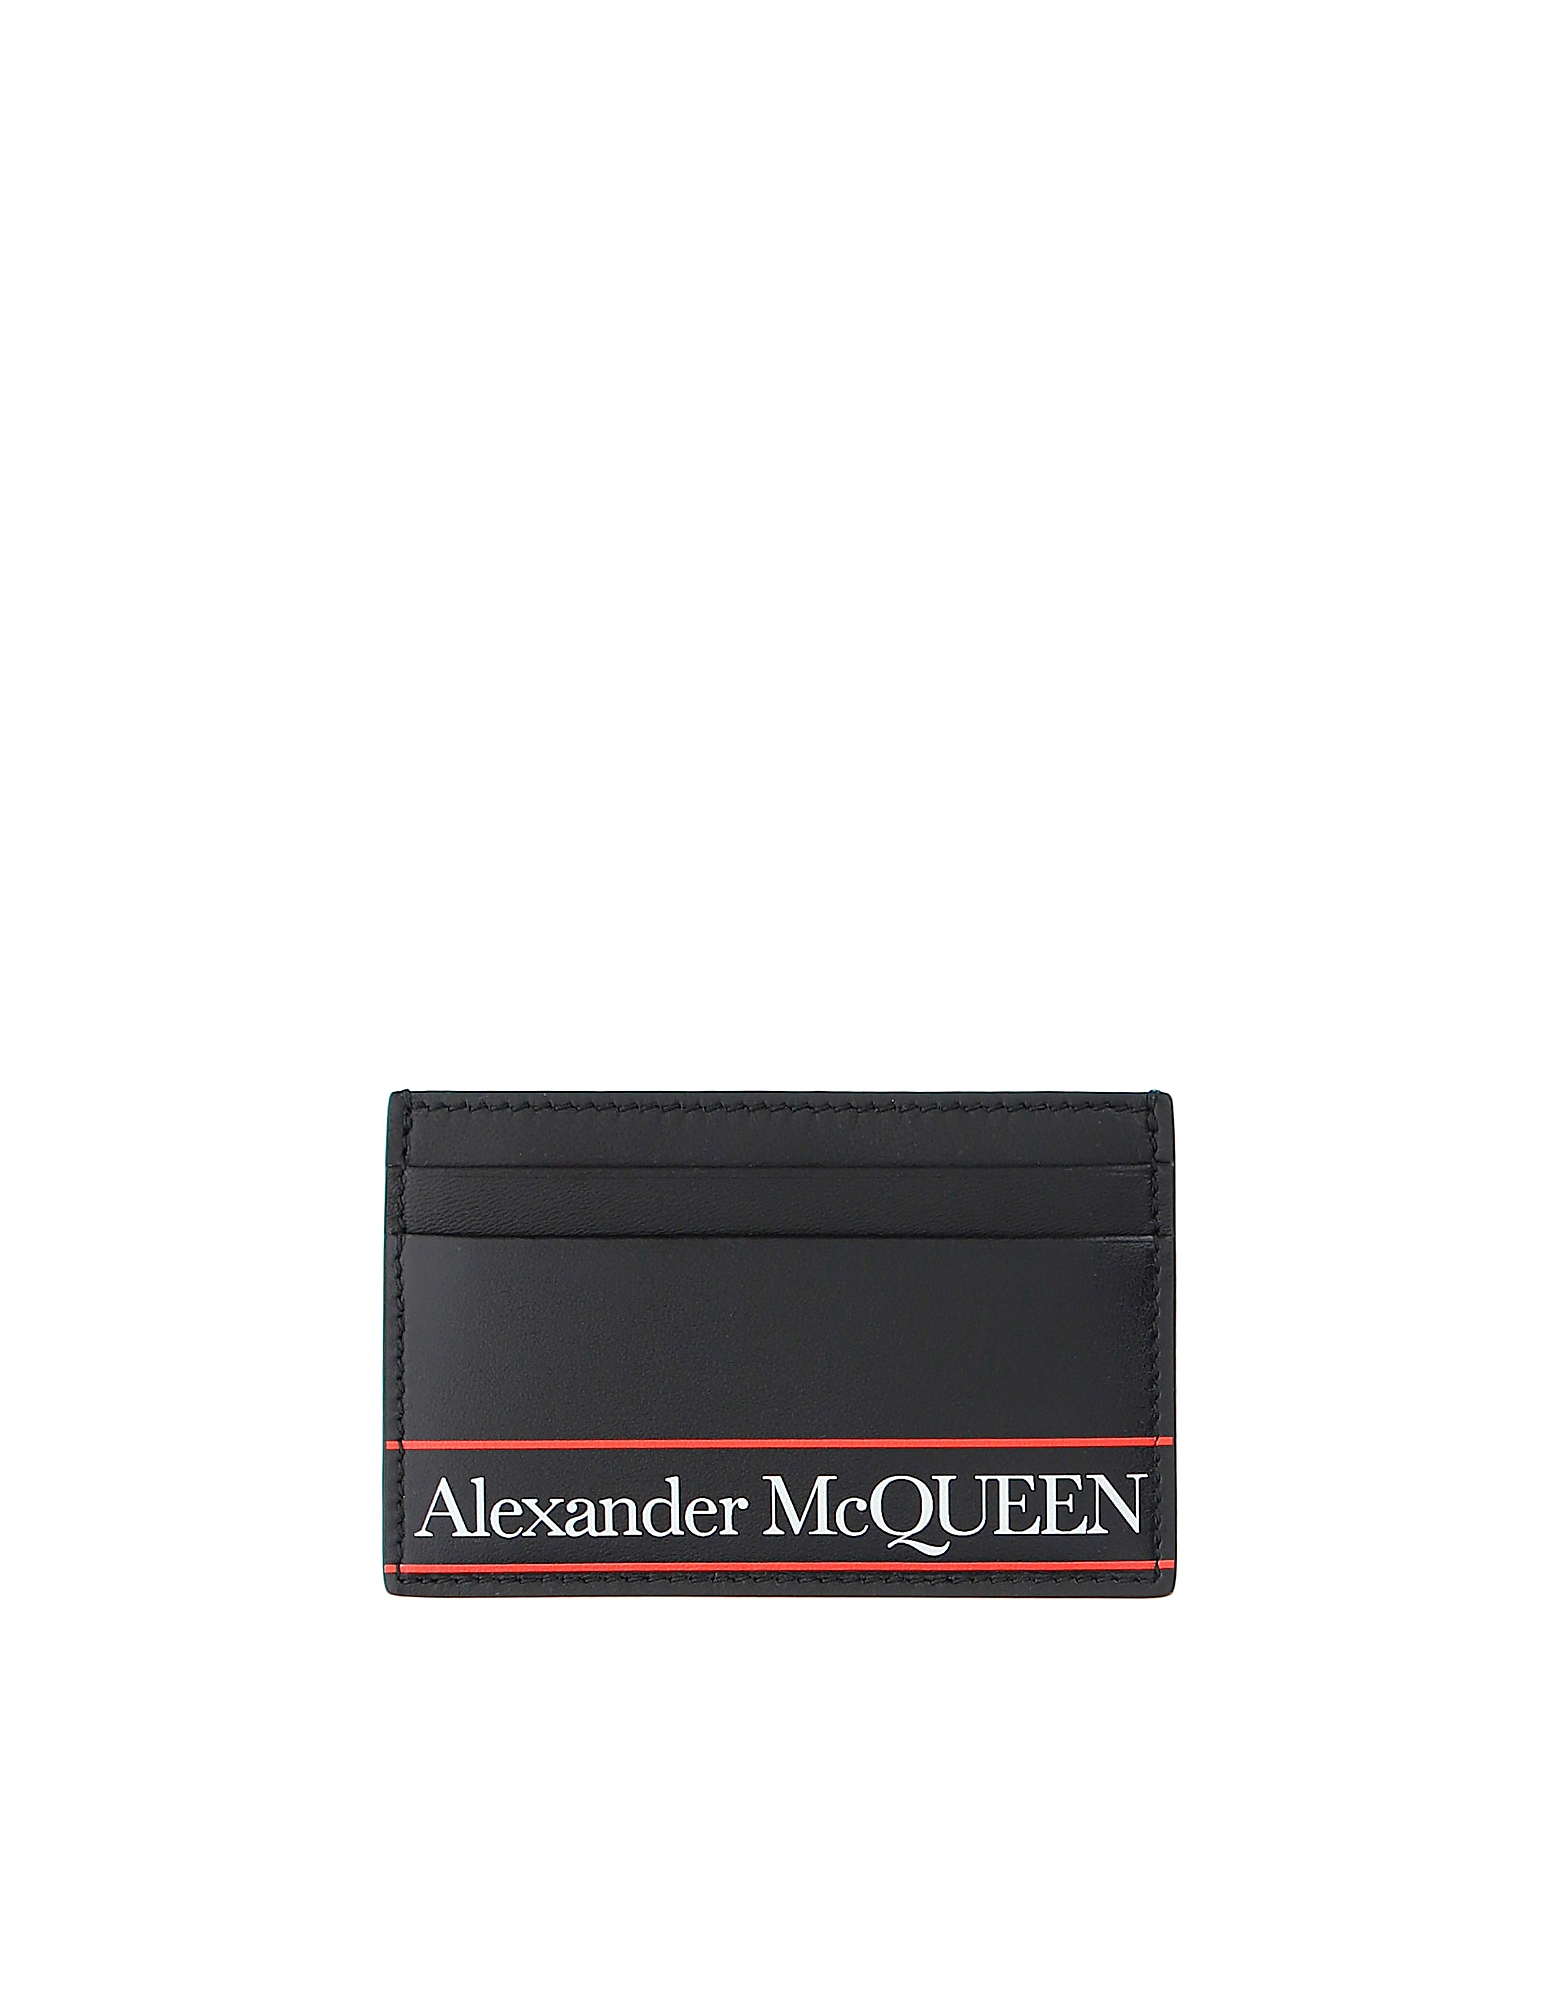 Alexander McQueen Designer Men's Bags, Black and Red Signature Card Holder